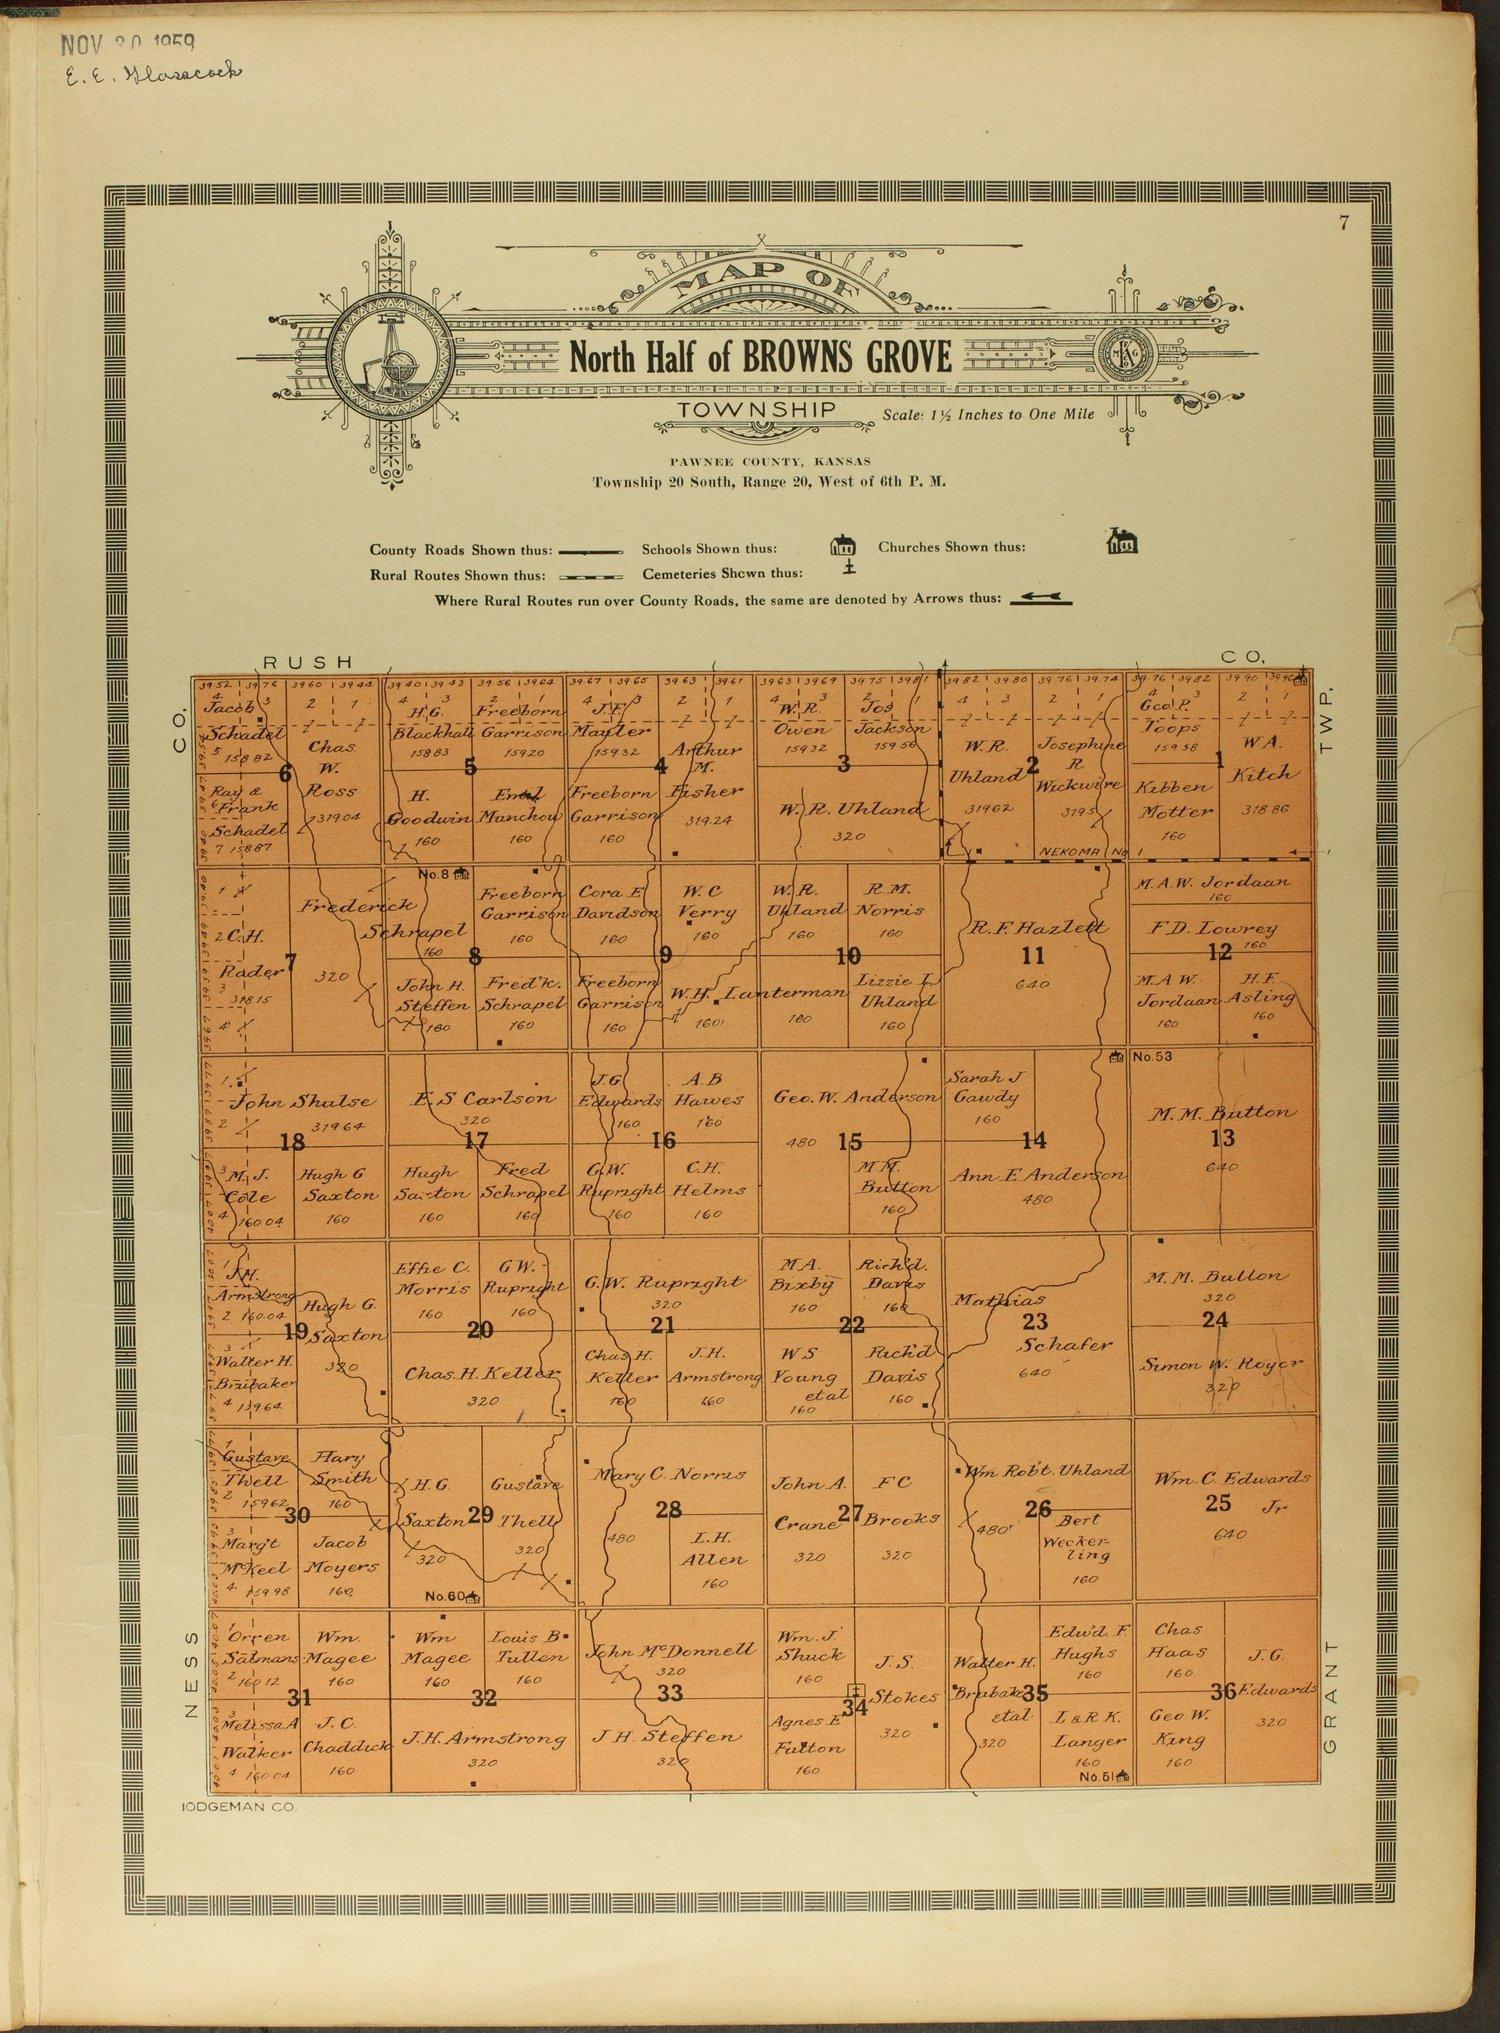 Atlas and plat book of Pawnee County, Kansas - 7